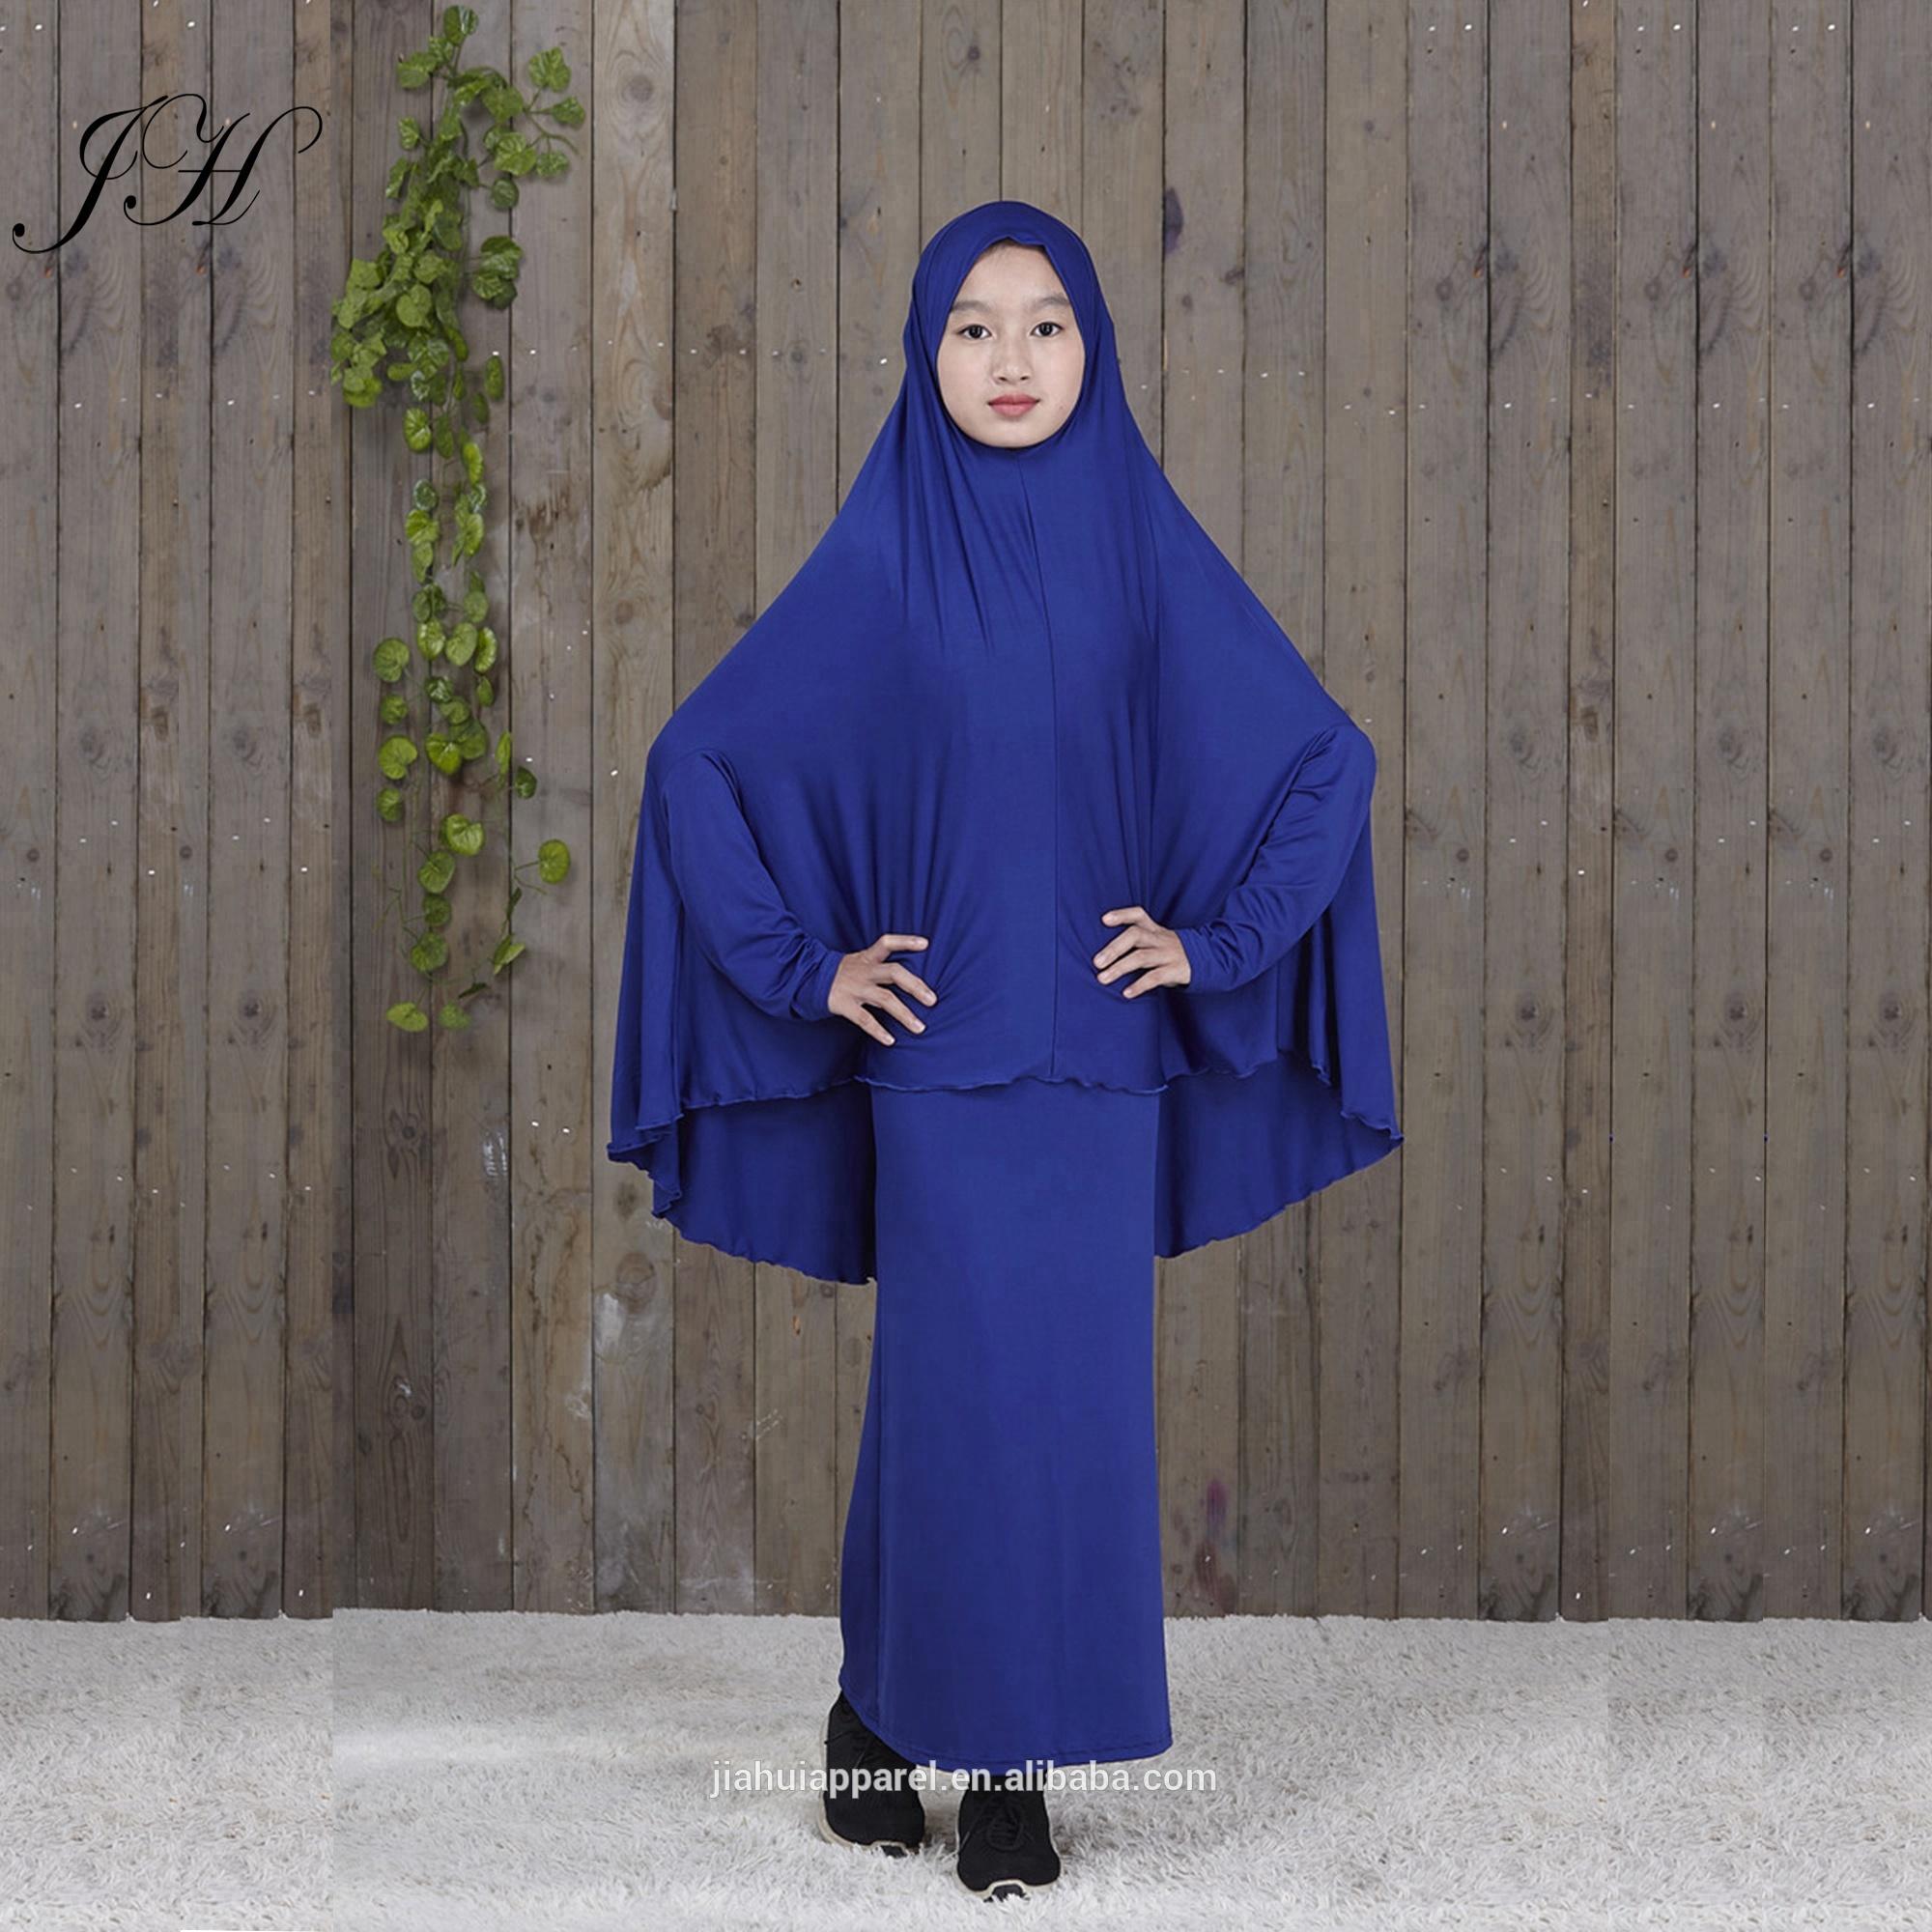 Wholesale Solid Color Muslim Kids Overhead Jilbab Two Piece Hijab Abaya Khimar Headscarf Prayer dress